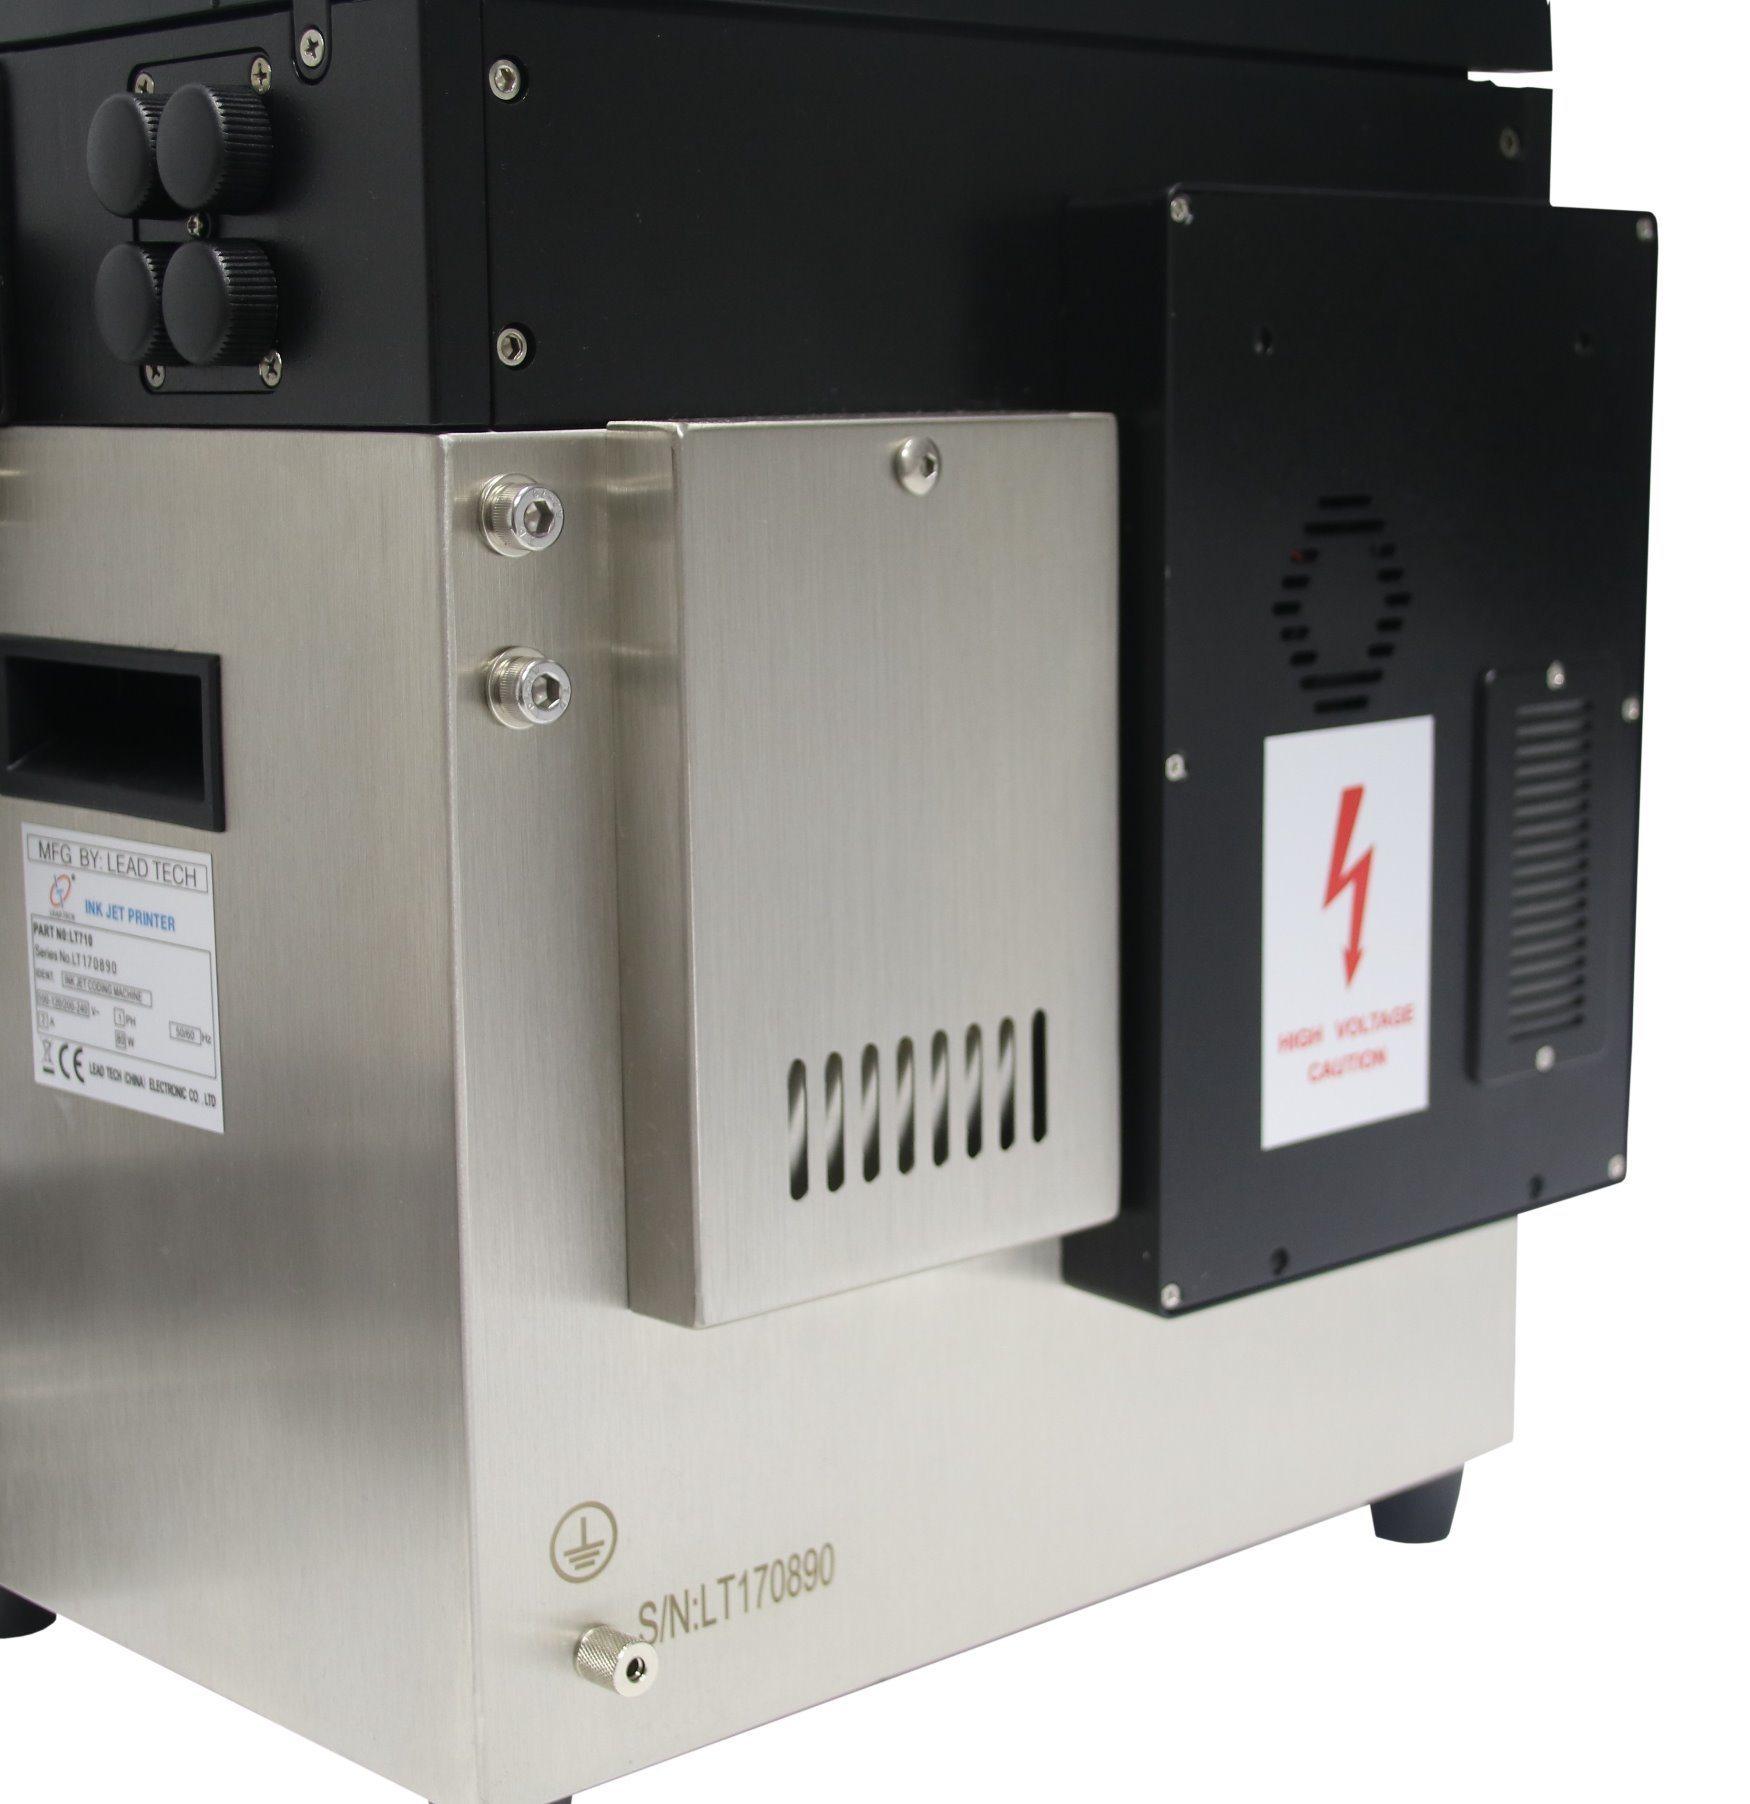 Lead Tech Black to Blue Coding Continuous Cij Inkjet Printer Lt760